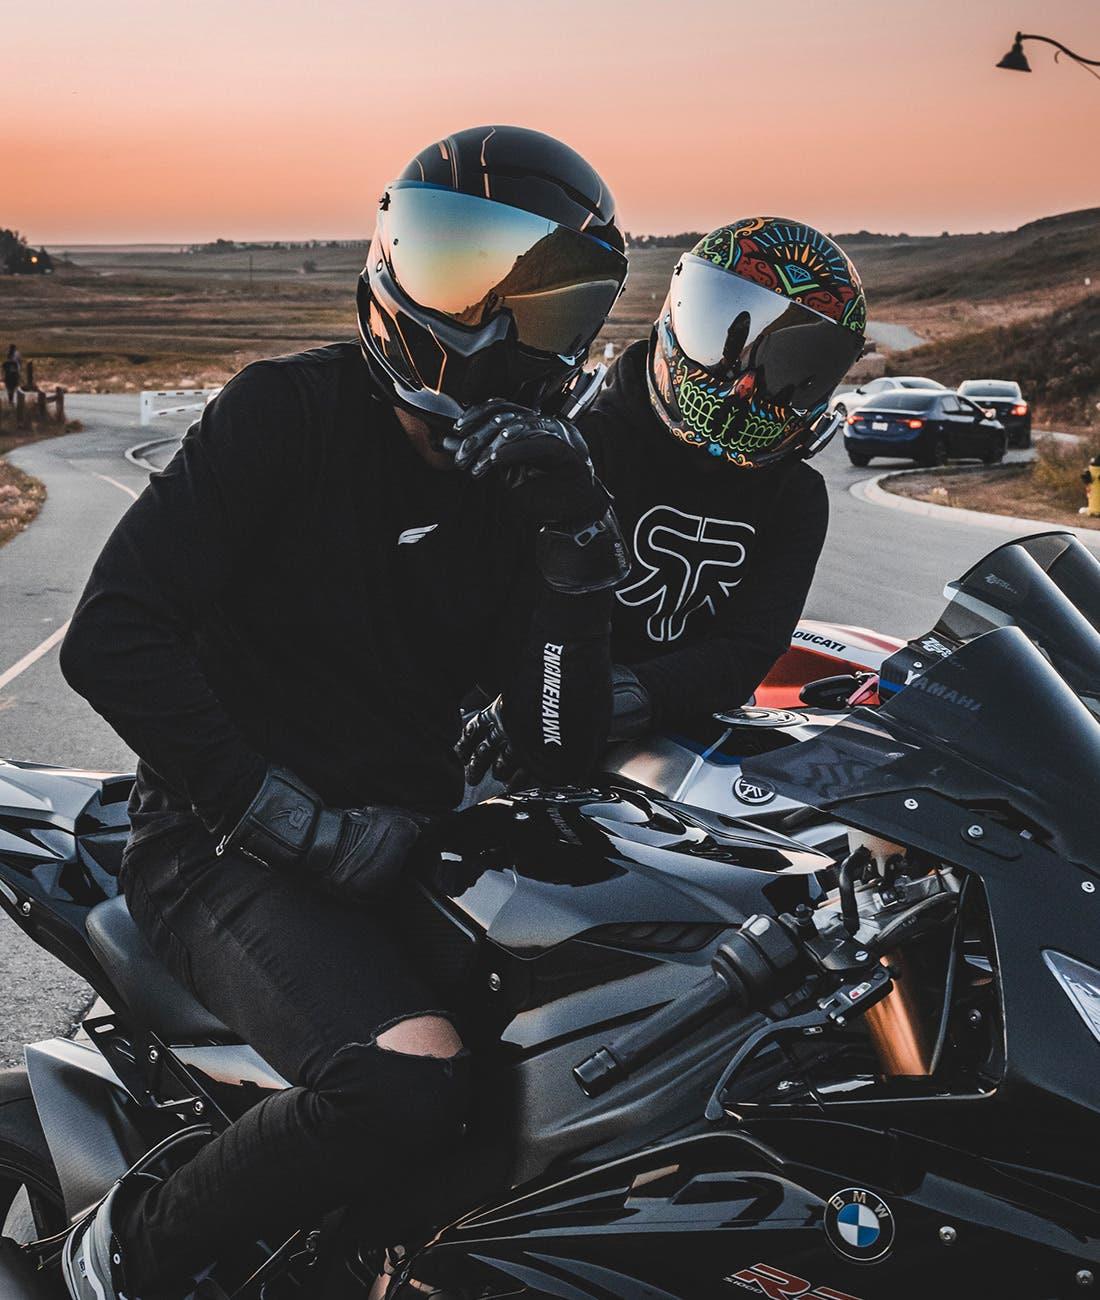 Rider gallery entry